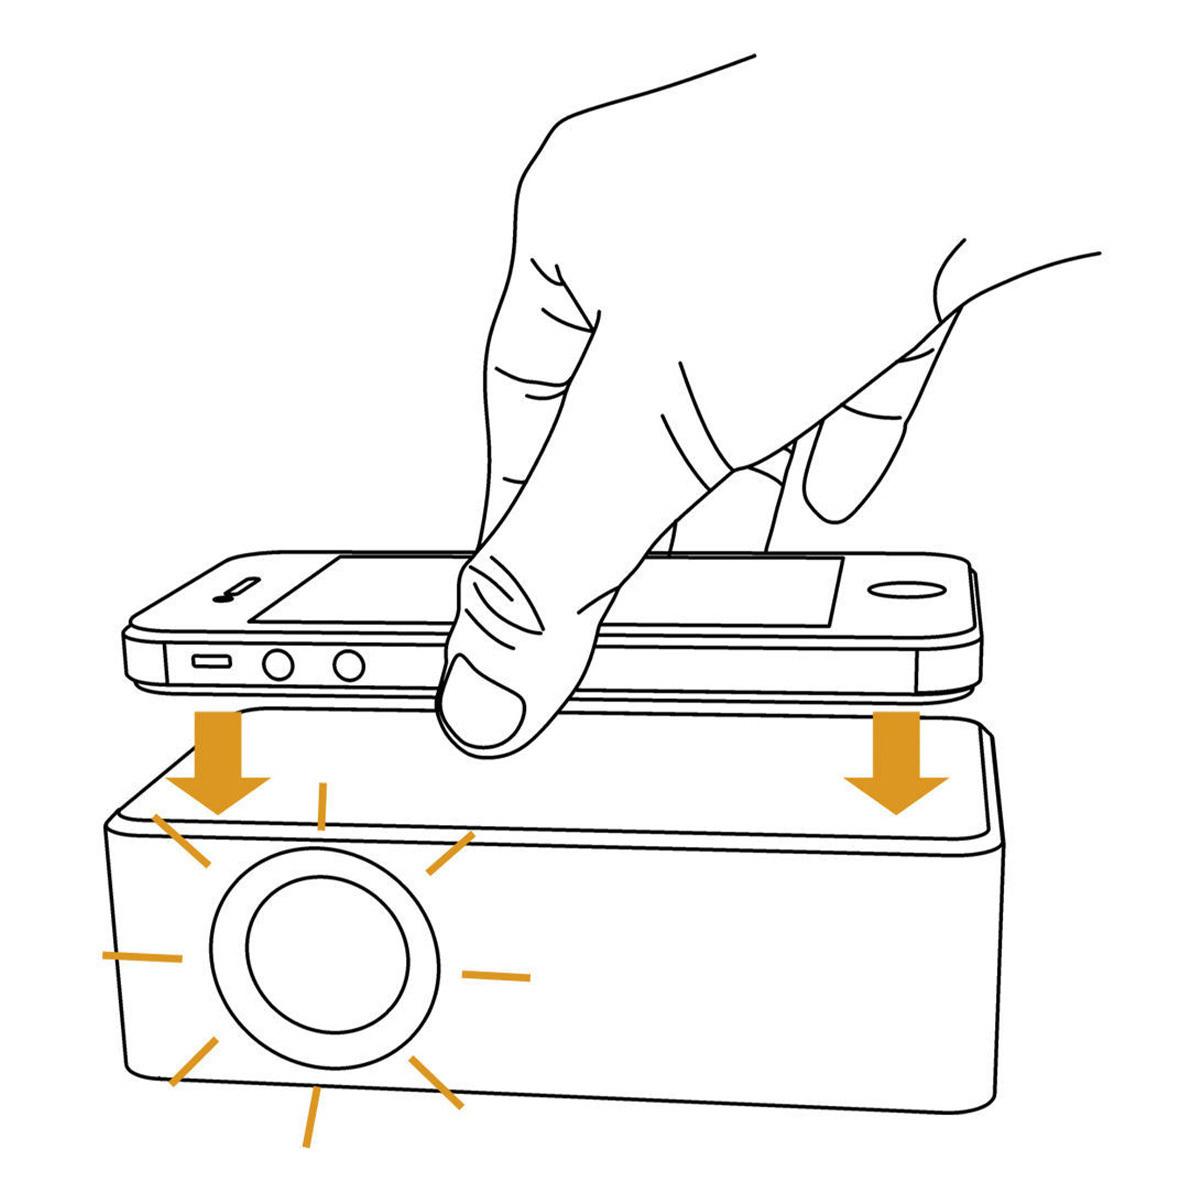 98-1108-01-mobiler-lautsprecher-für-smartphones-touchplay-upbeat-anwendung-1200x1200px.jpg